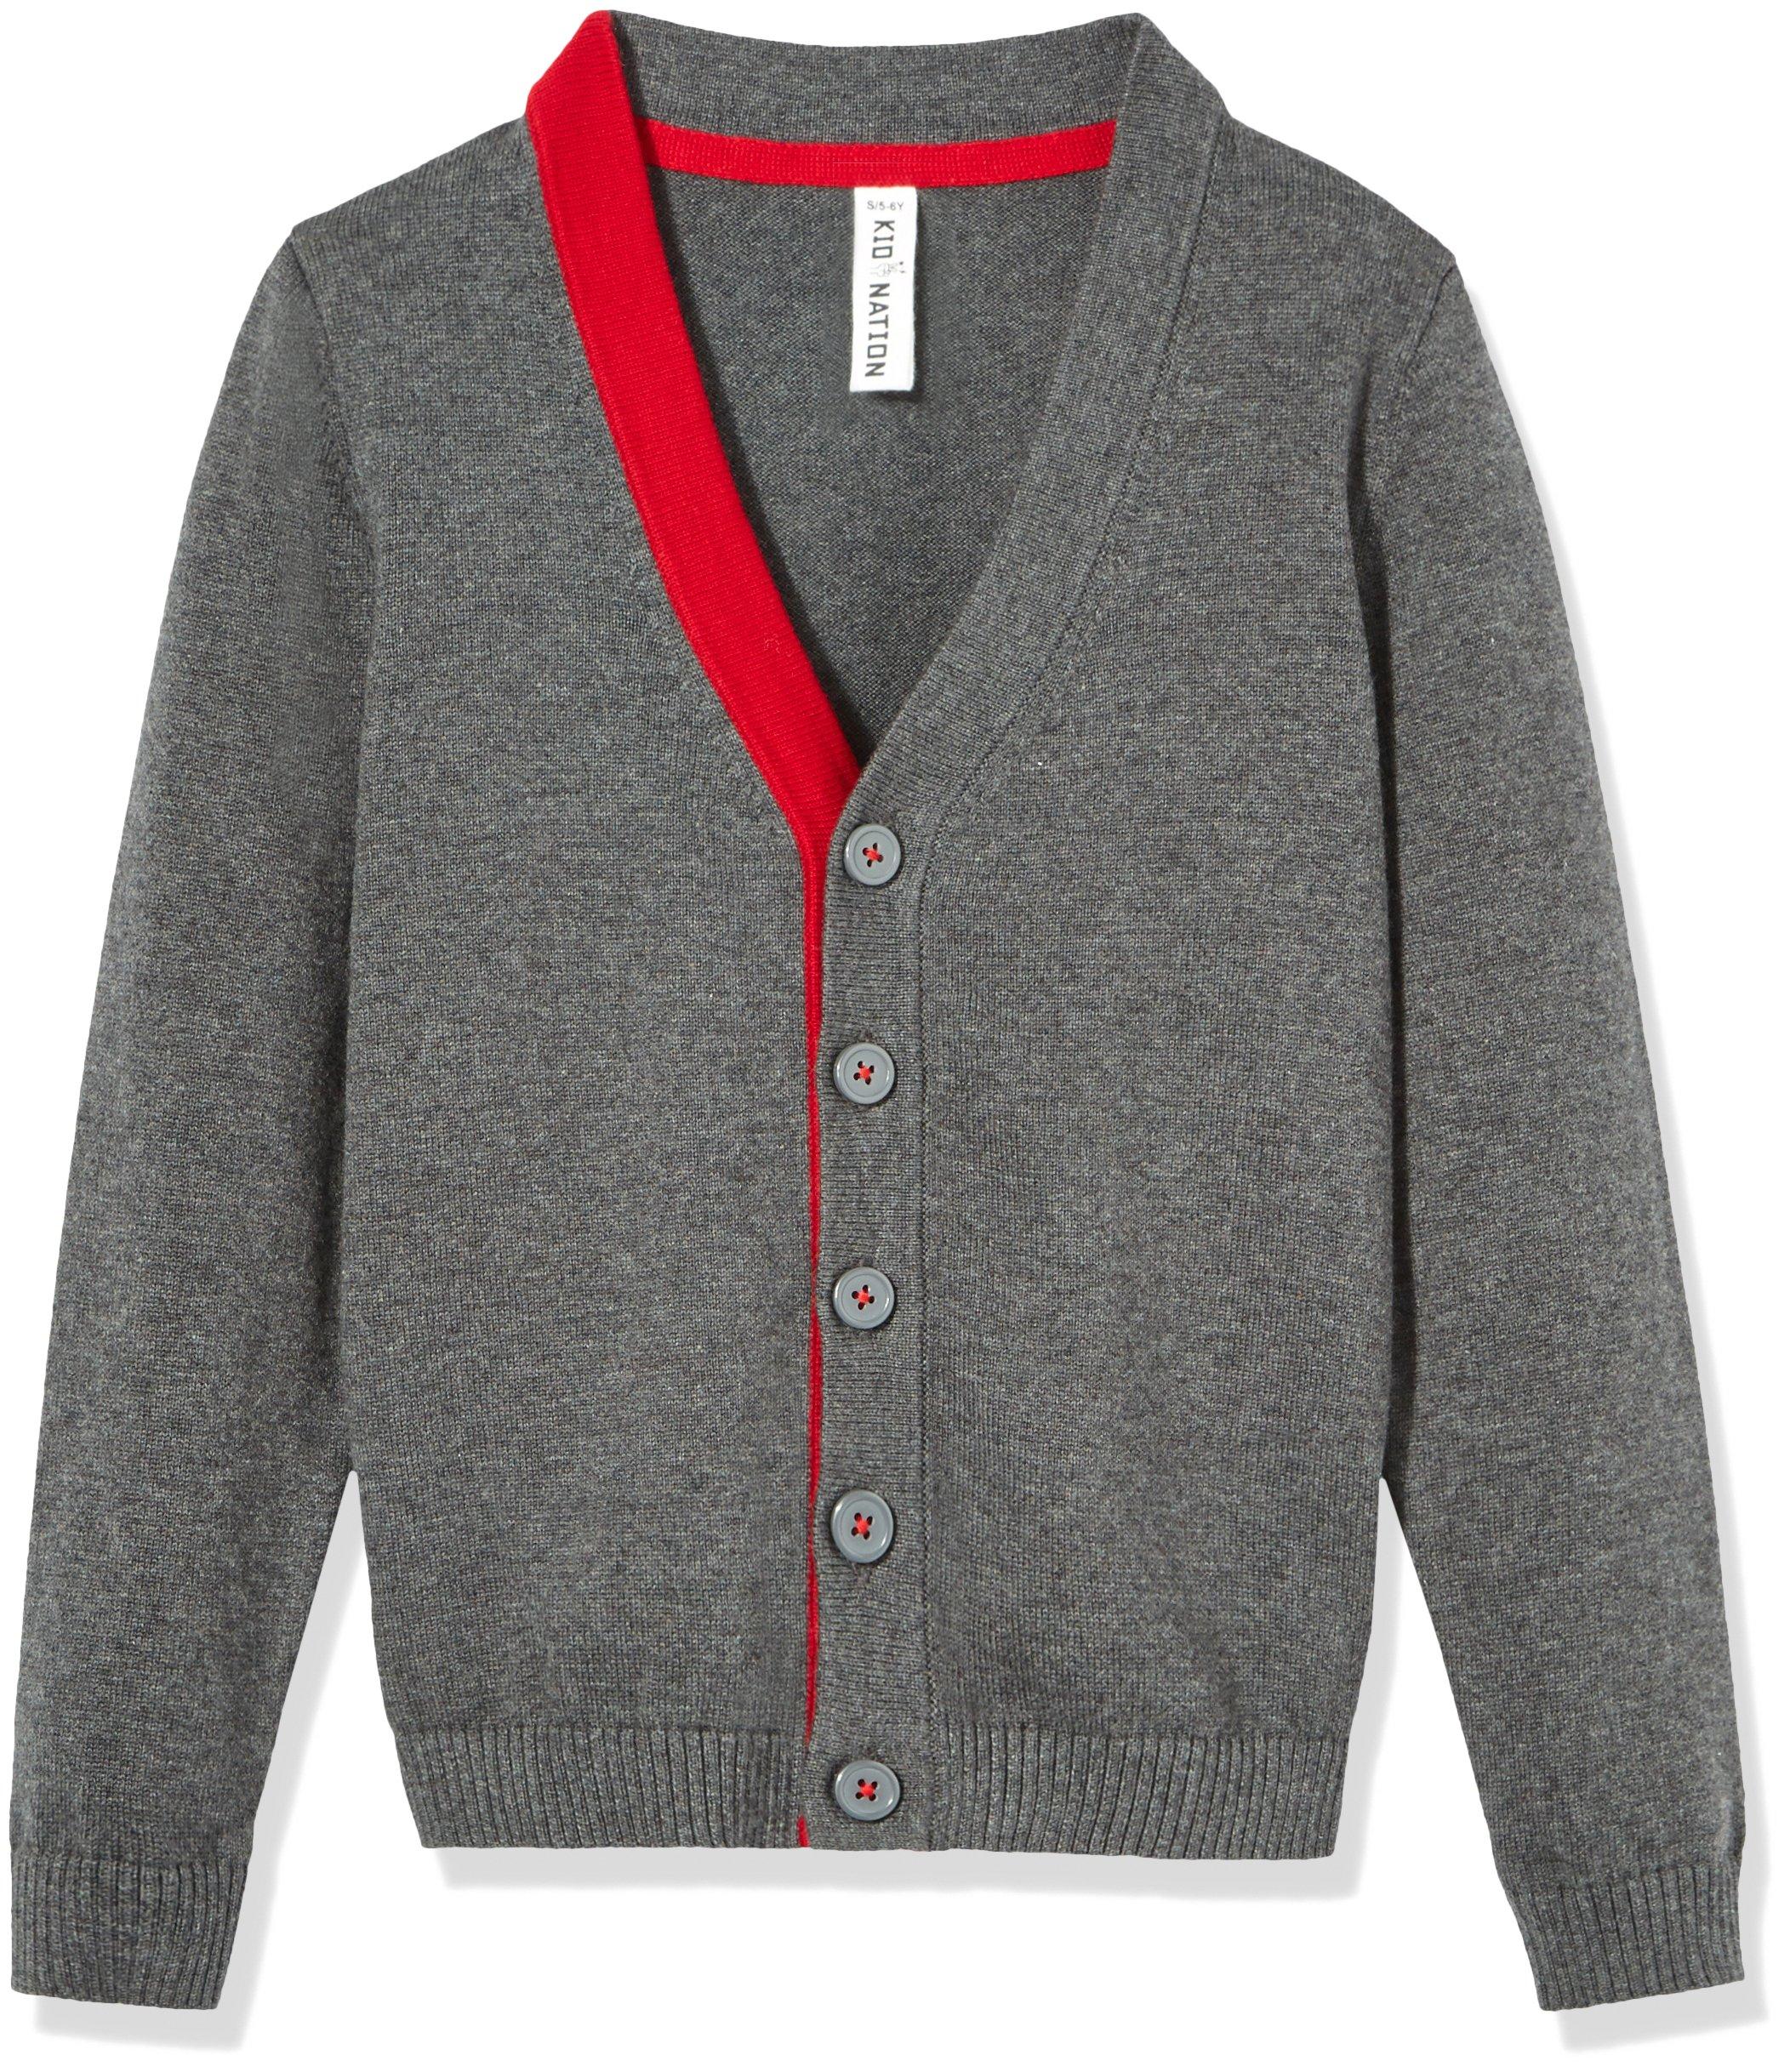 Kid Nation Boys' Long Sleeve Cardigan Sweater L Dark Grey